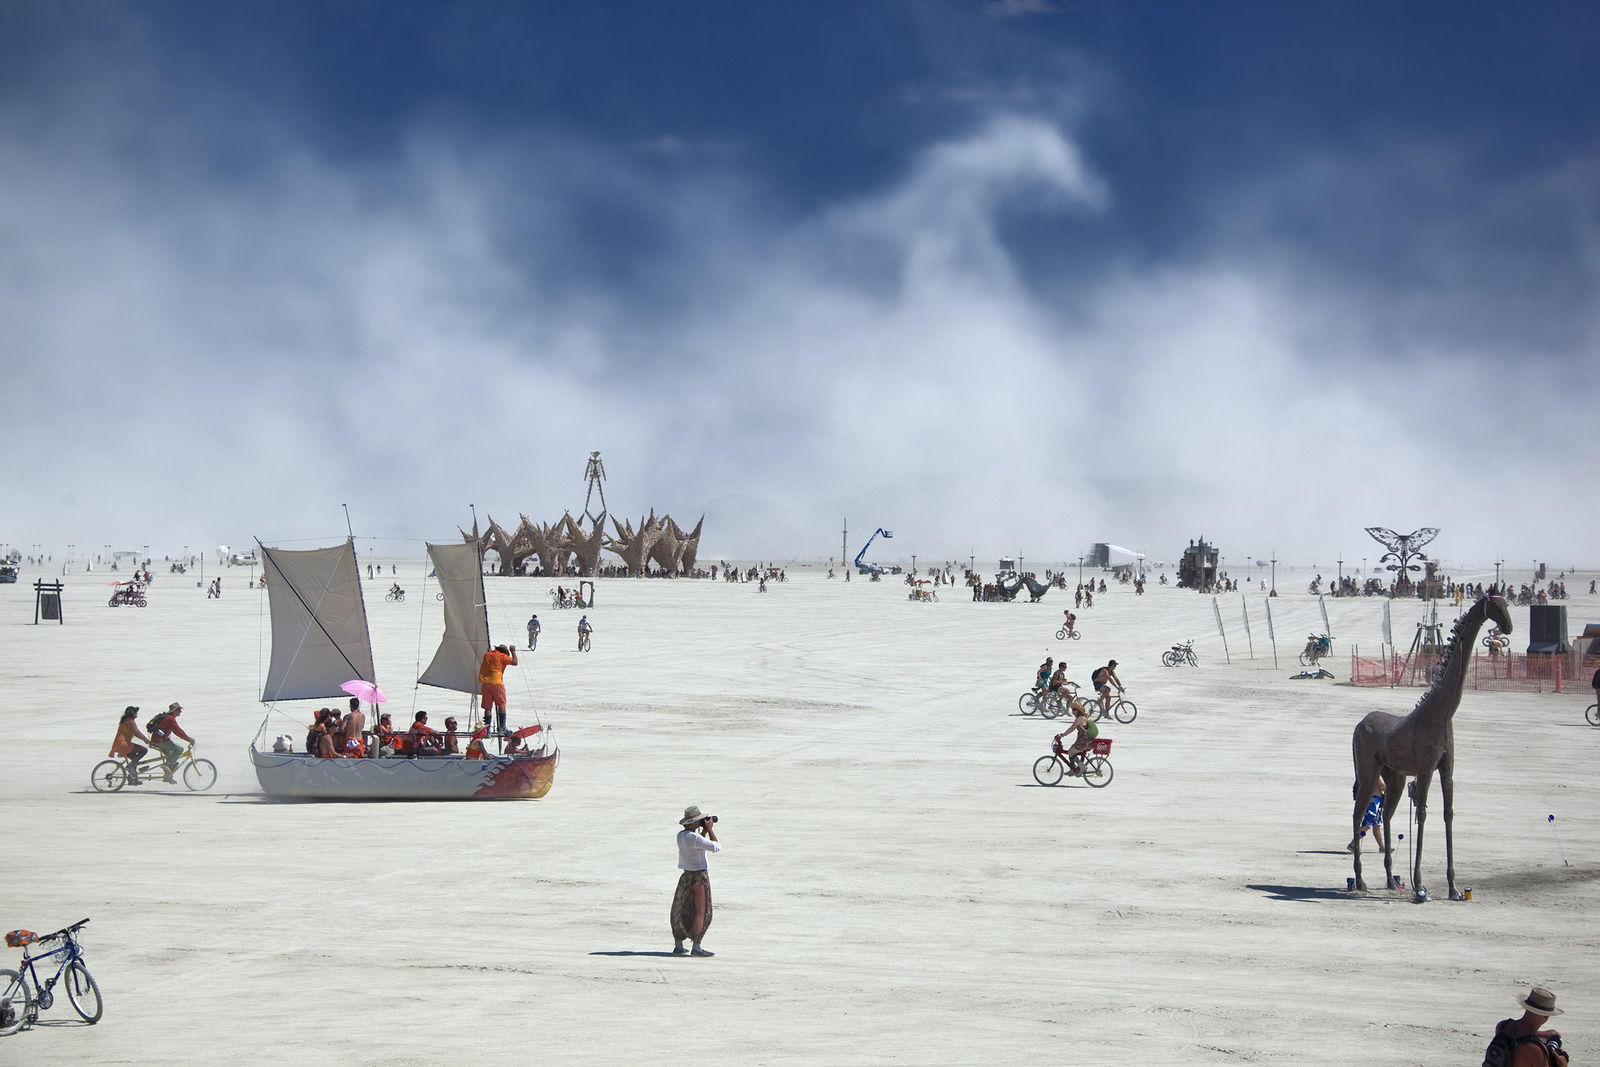 Pavel Antonov. Burning Man. City of Sand. _MG_7830-Edit copy